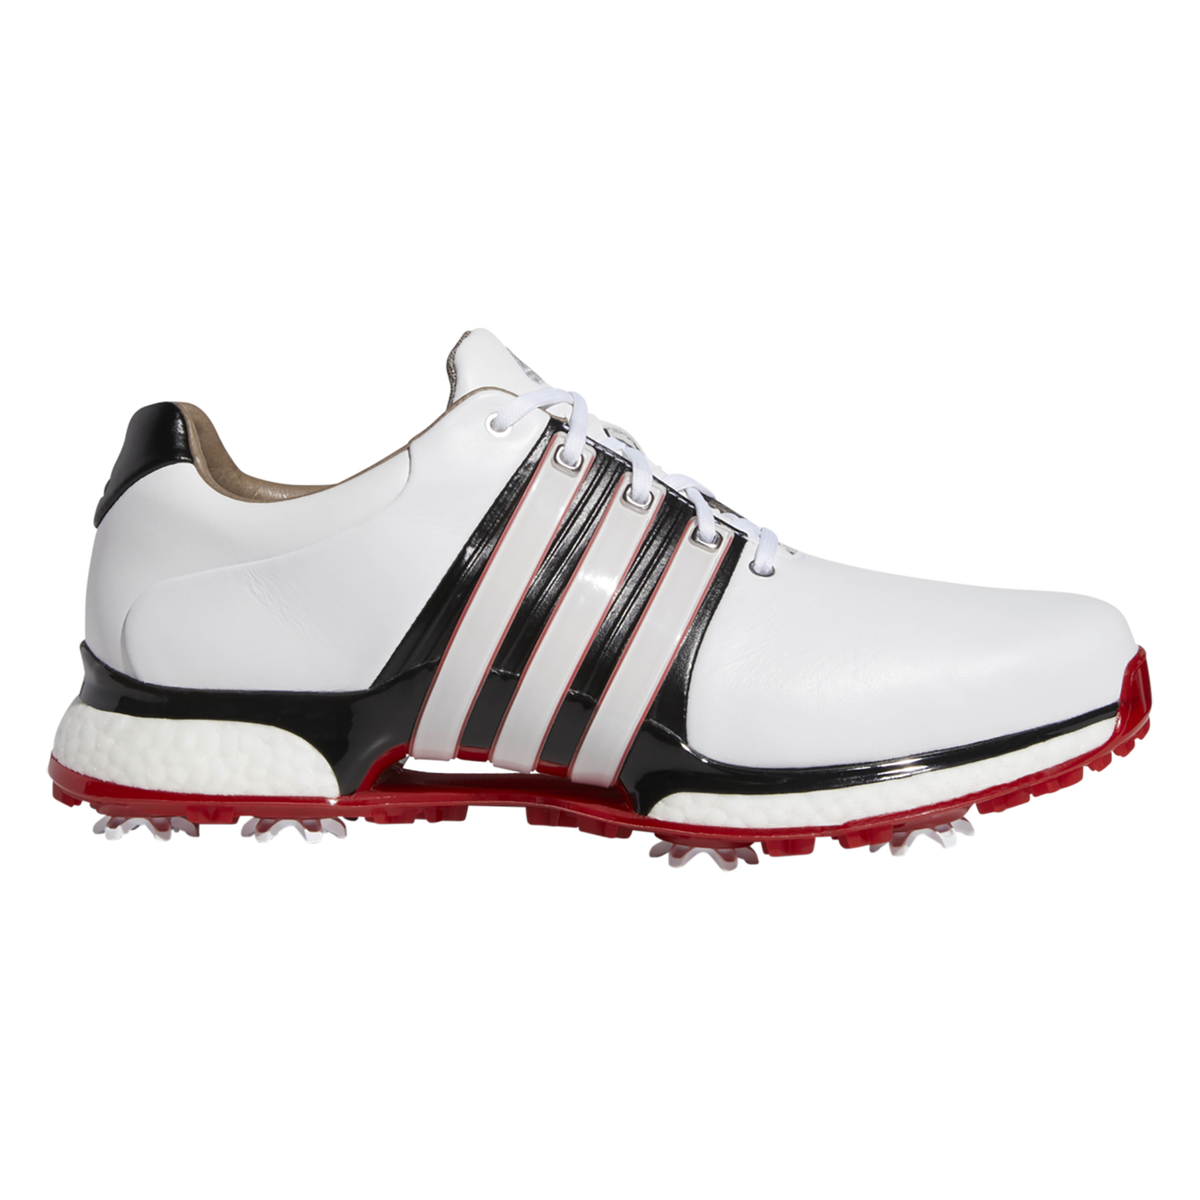 db237973edc adidas TOUR360 XT Men s Golf Shoe - White Black